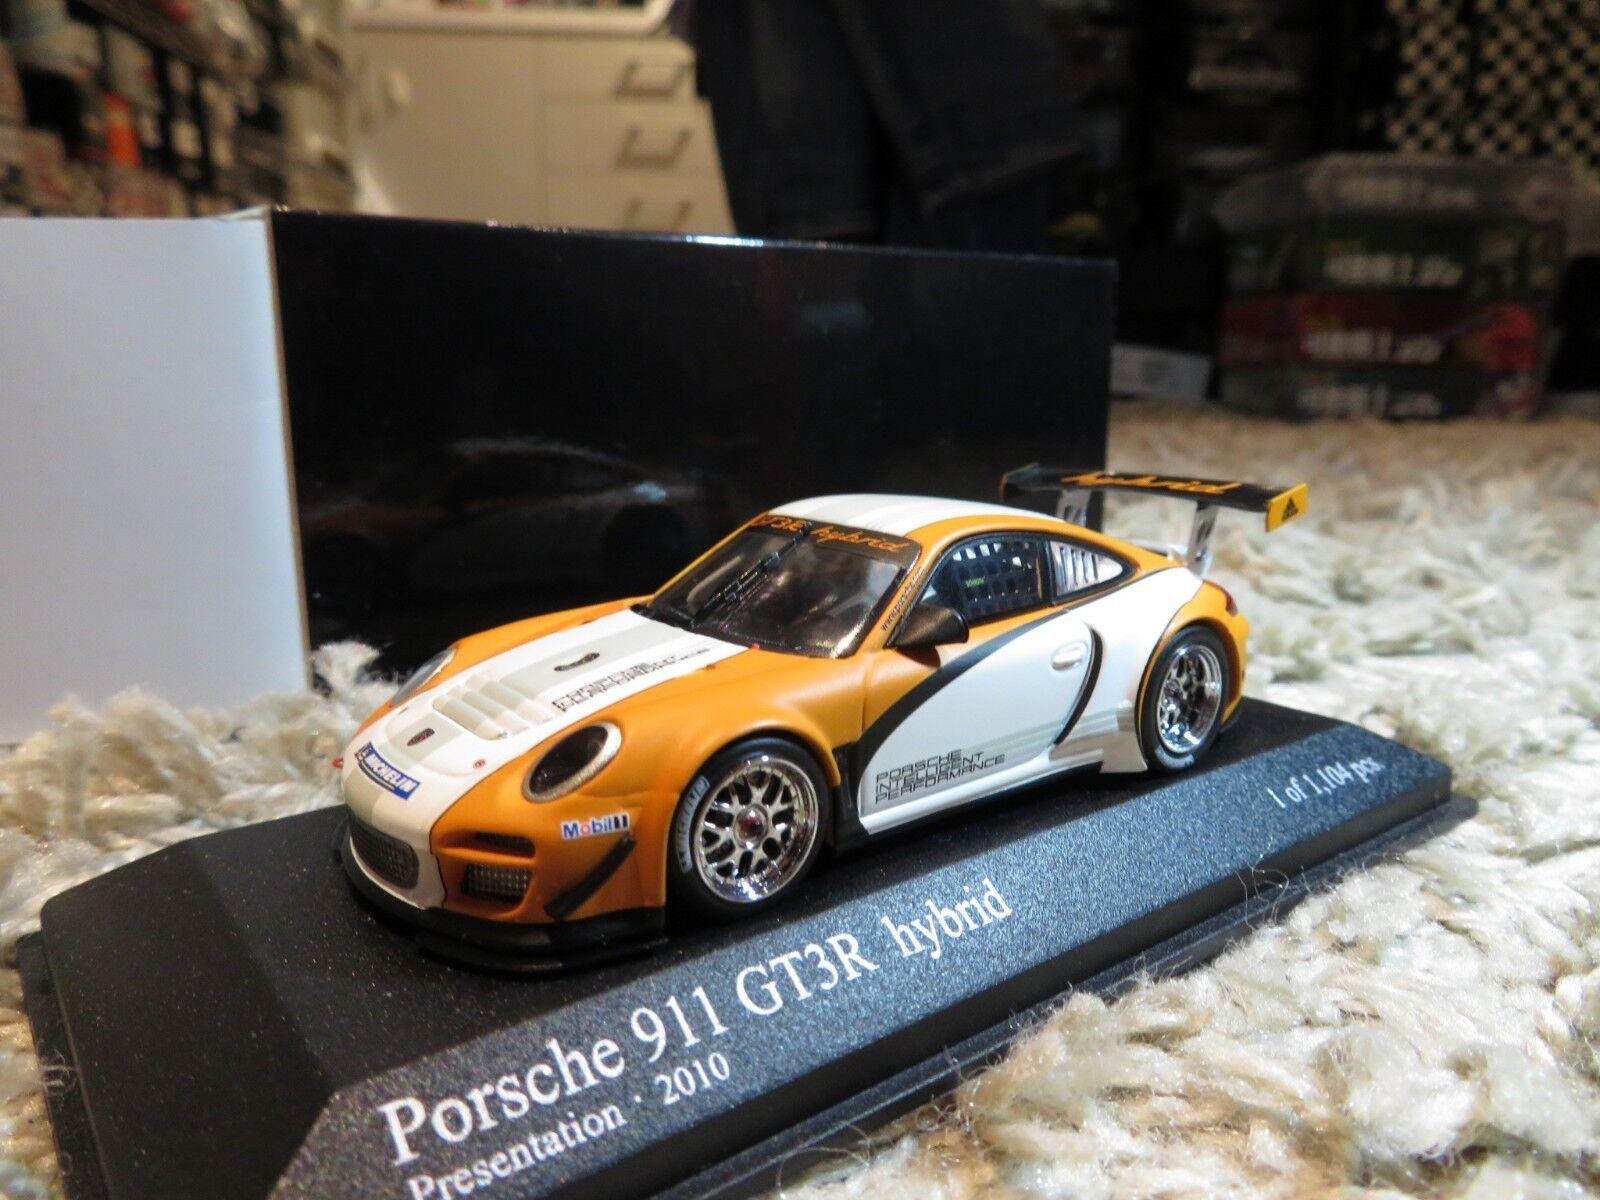 1/43 Minichamps PORSCHE 911 presentación híbrida GT3R (2018) Diecast